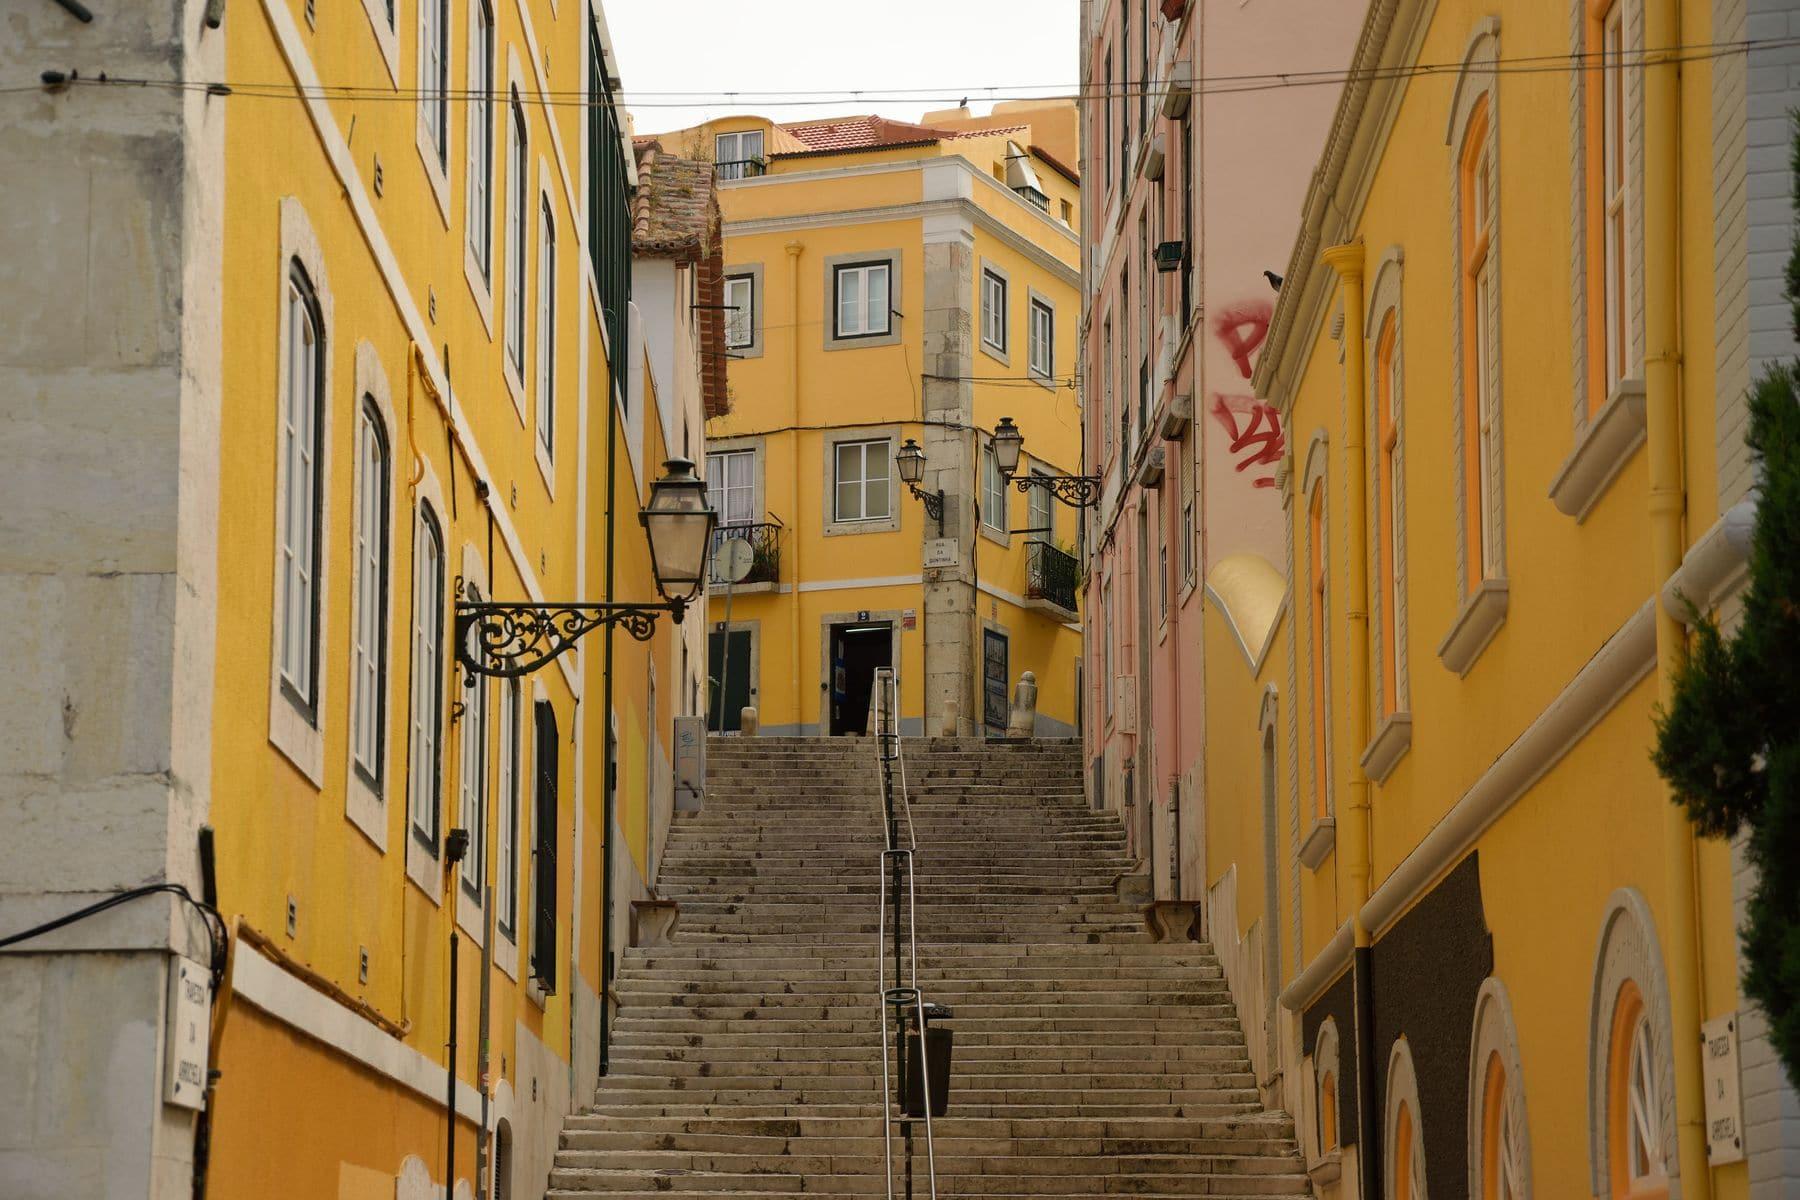 Strade ripide a Lisbona